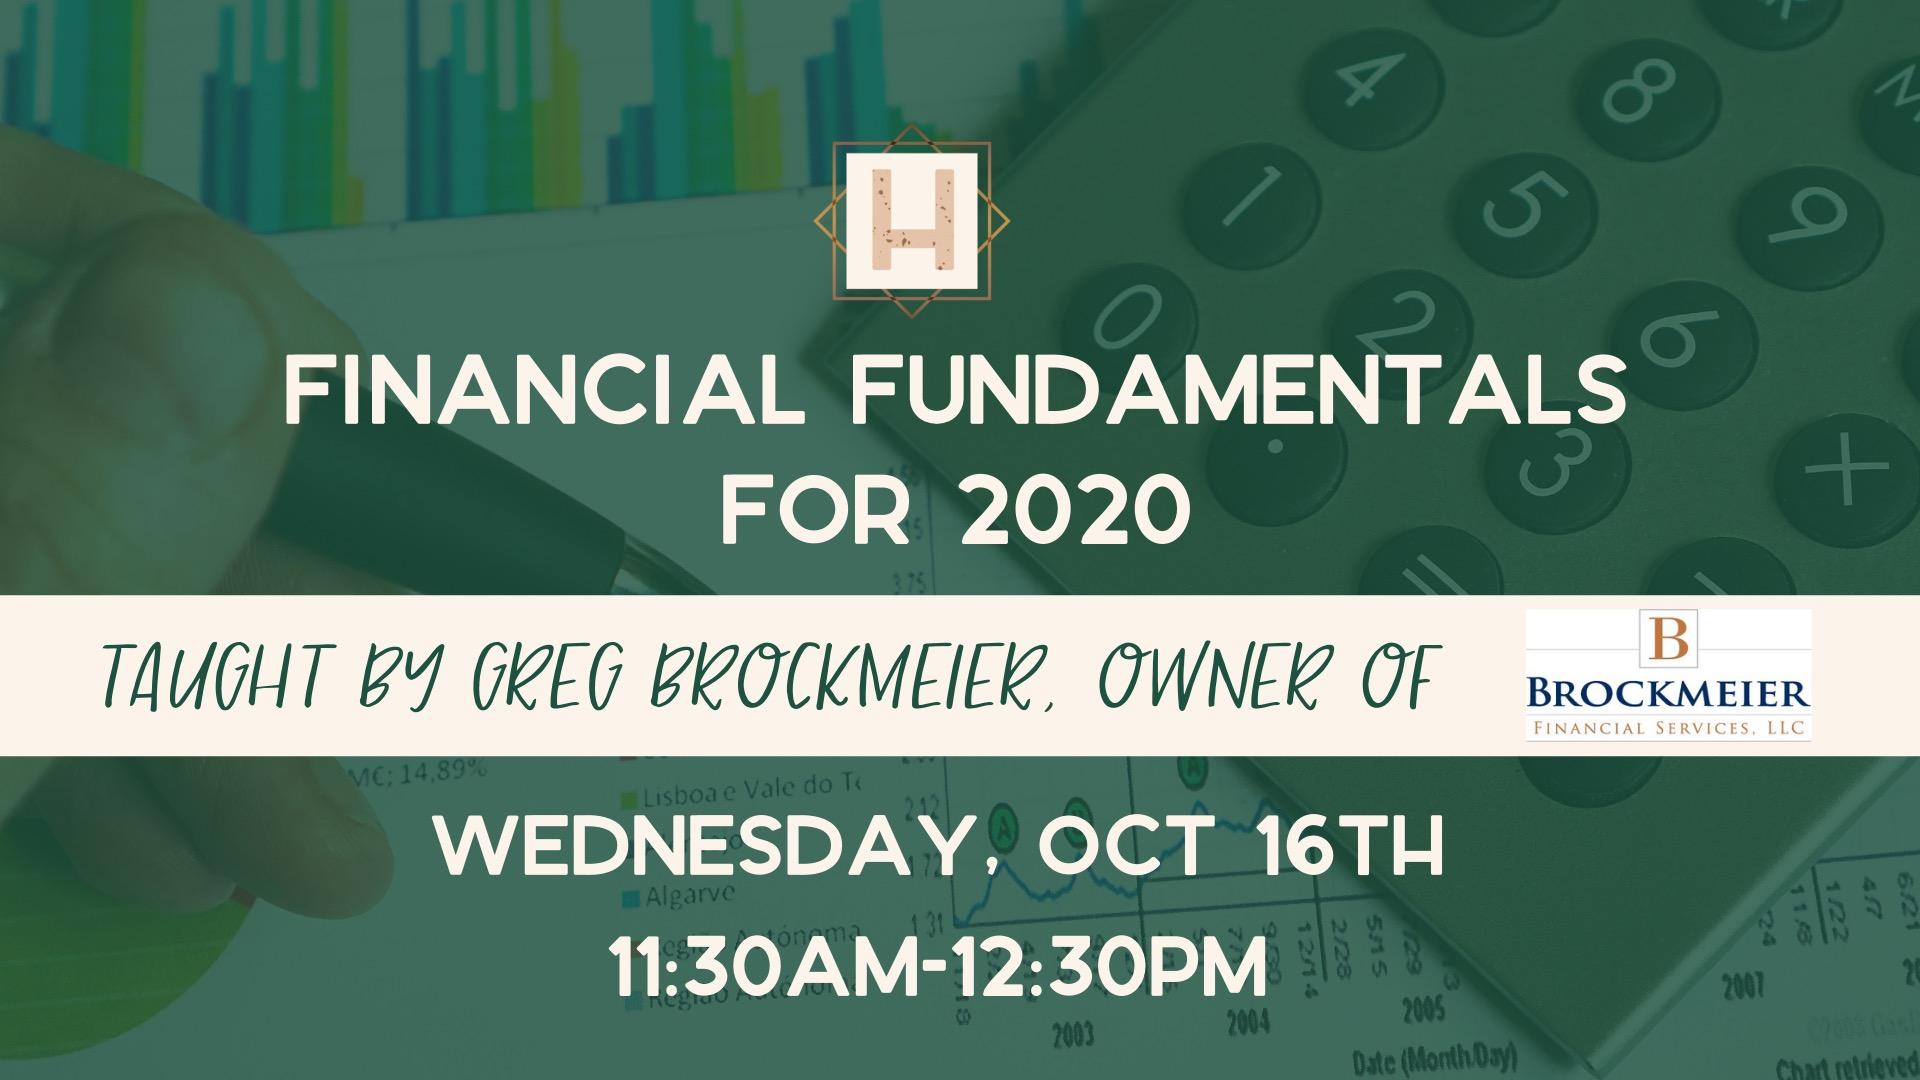 Financial Fundamentals for 2020.jpg